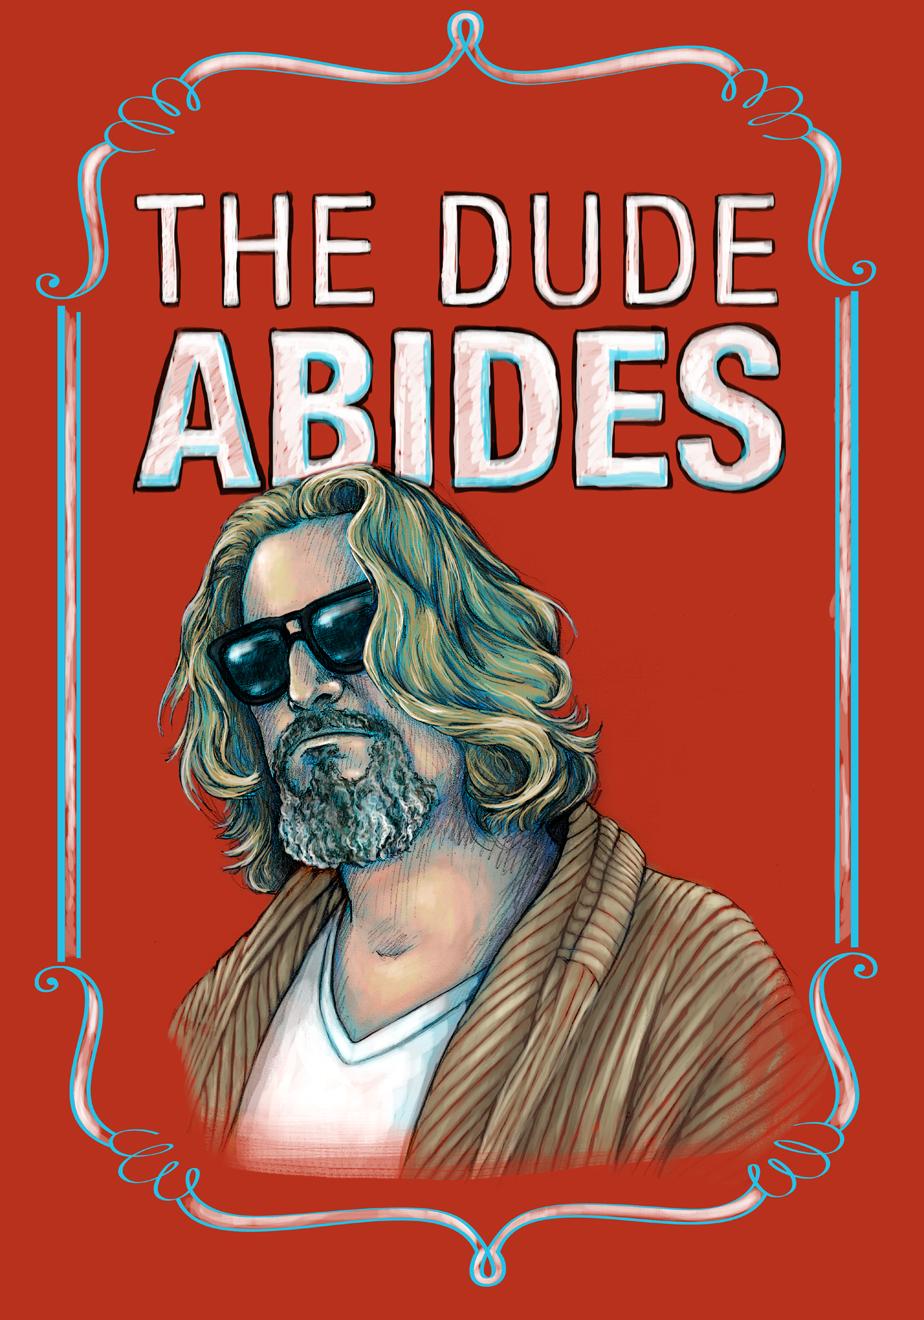 """The Dude Abides"" Jeffrey Lebowski from the Big Lebowski"